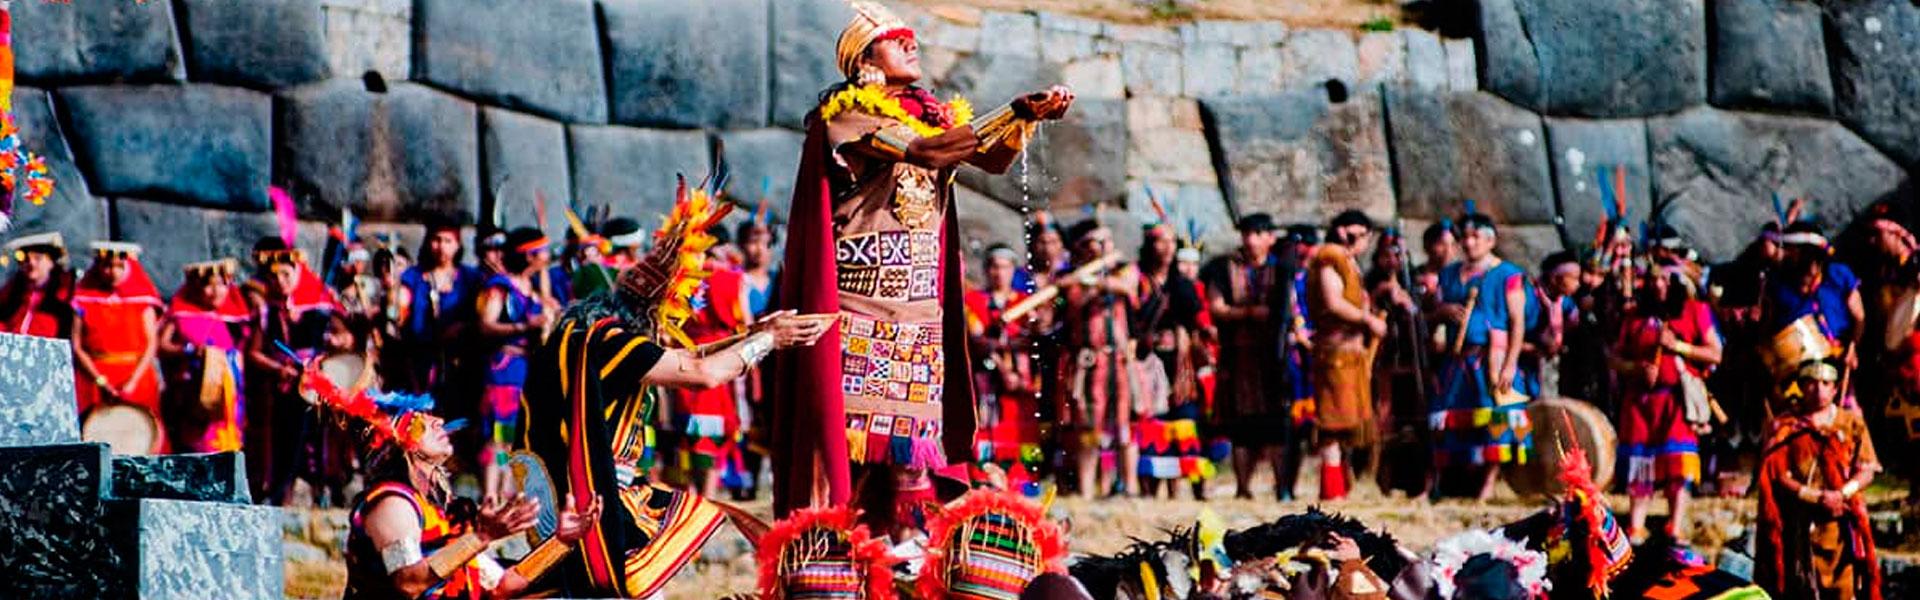 Inty Raymi Cusco 2019 Sun Festival full day | Cusco Inkas